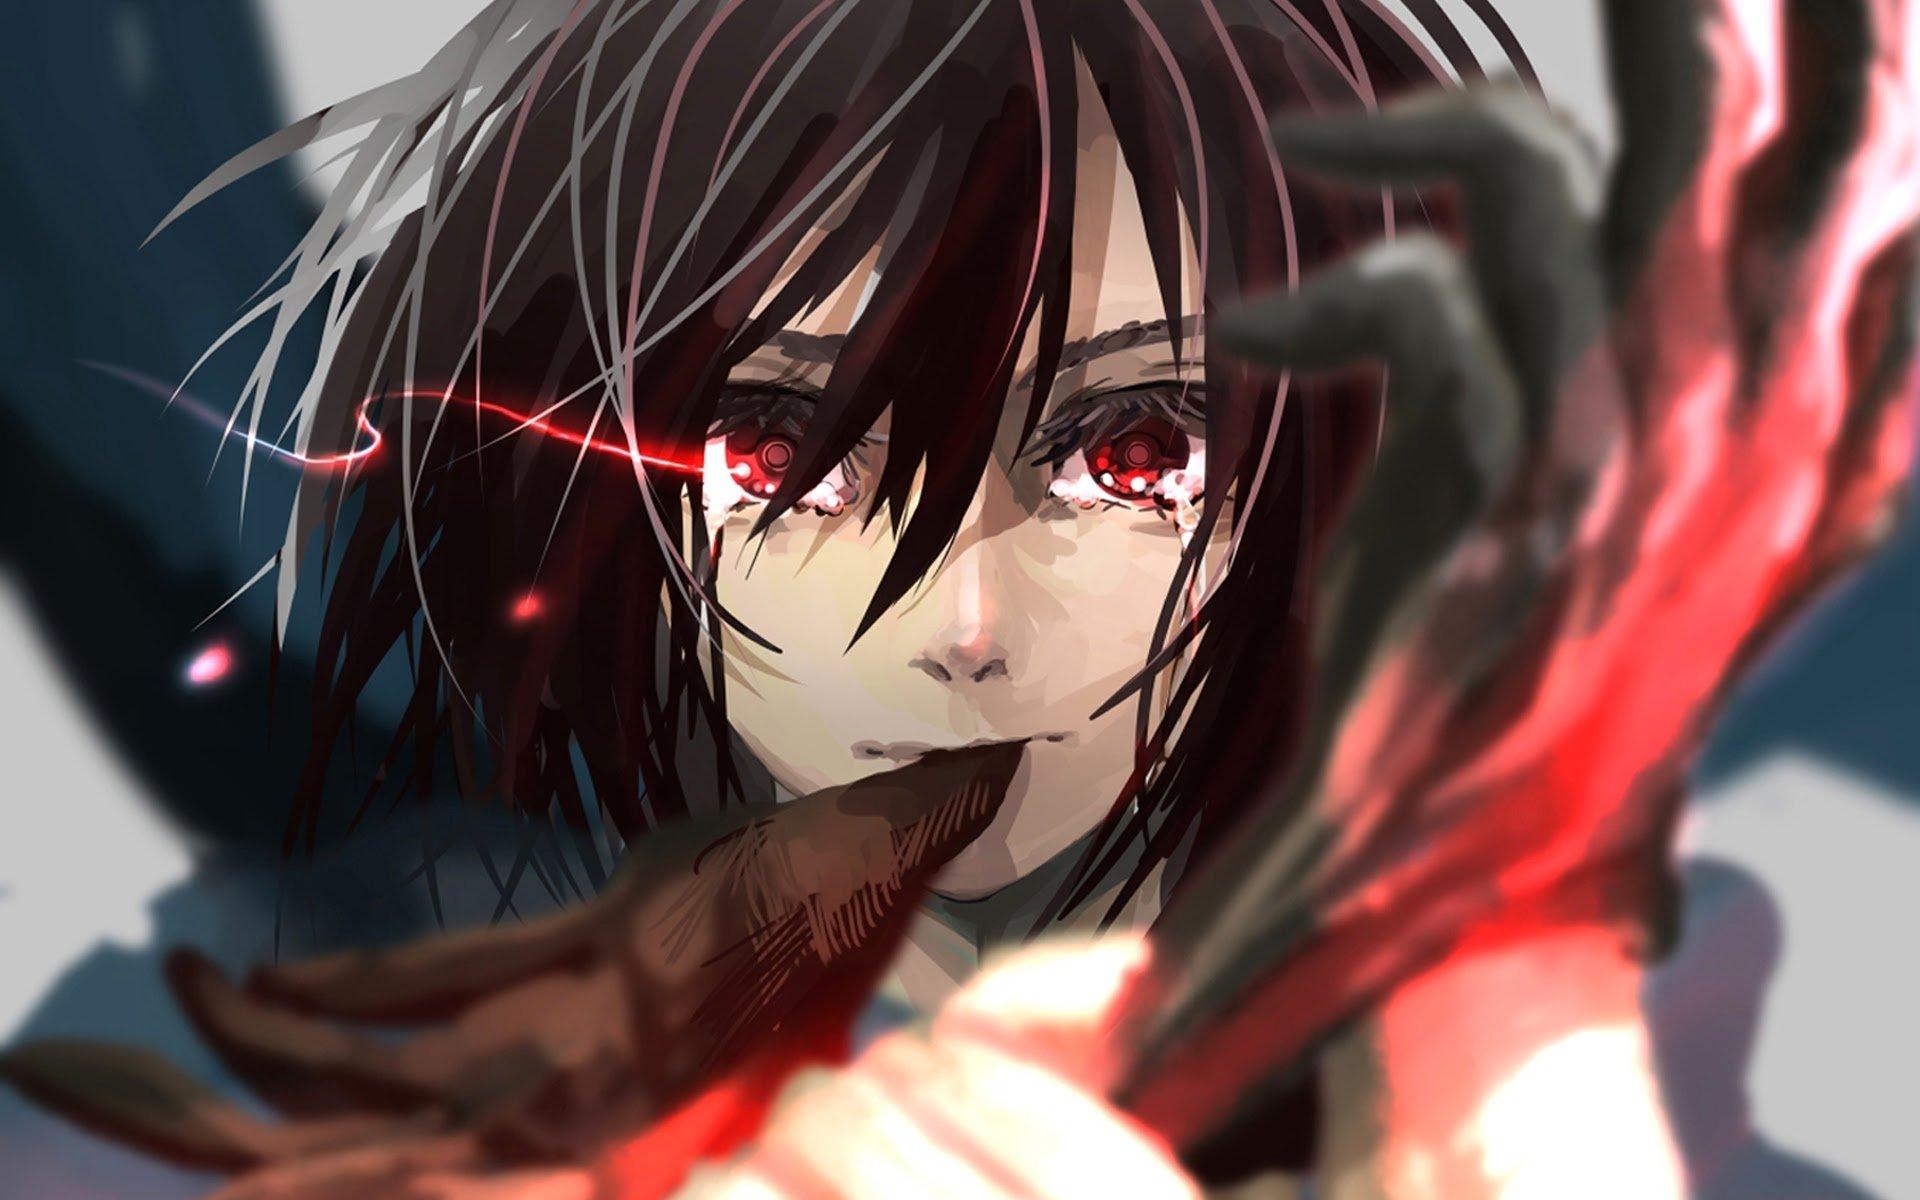 :) #anime wallpaper#anime lockscreen#attack on titan. Mikasa Ackerman HD Wallpaper | Background Image | 1920x1200